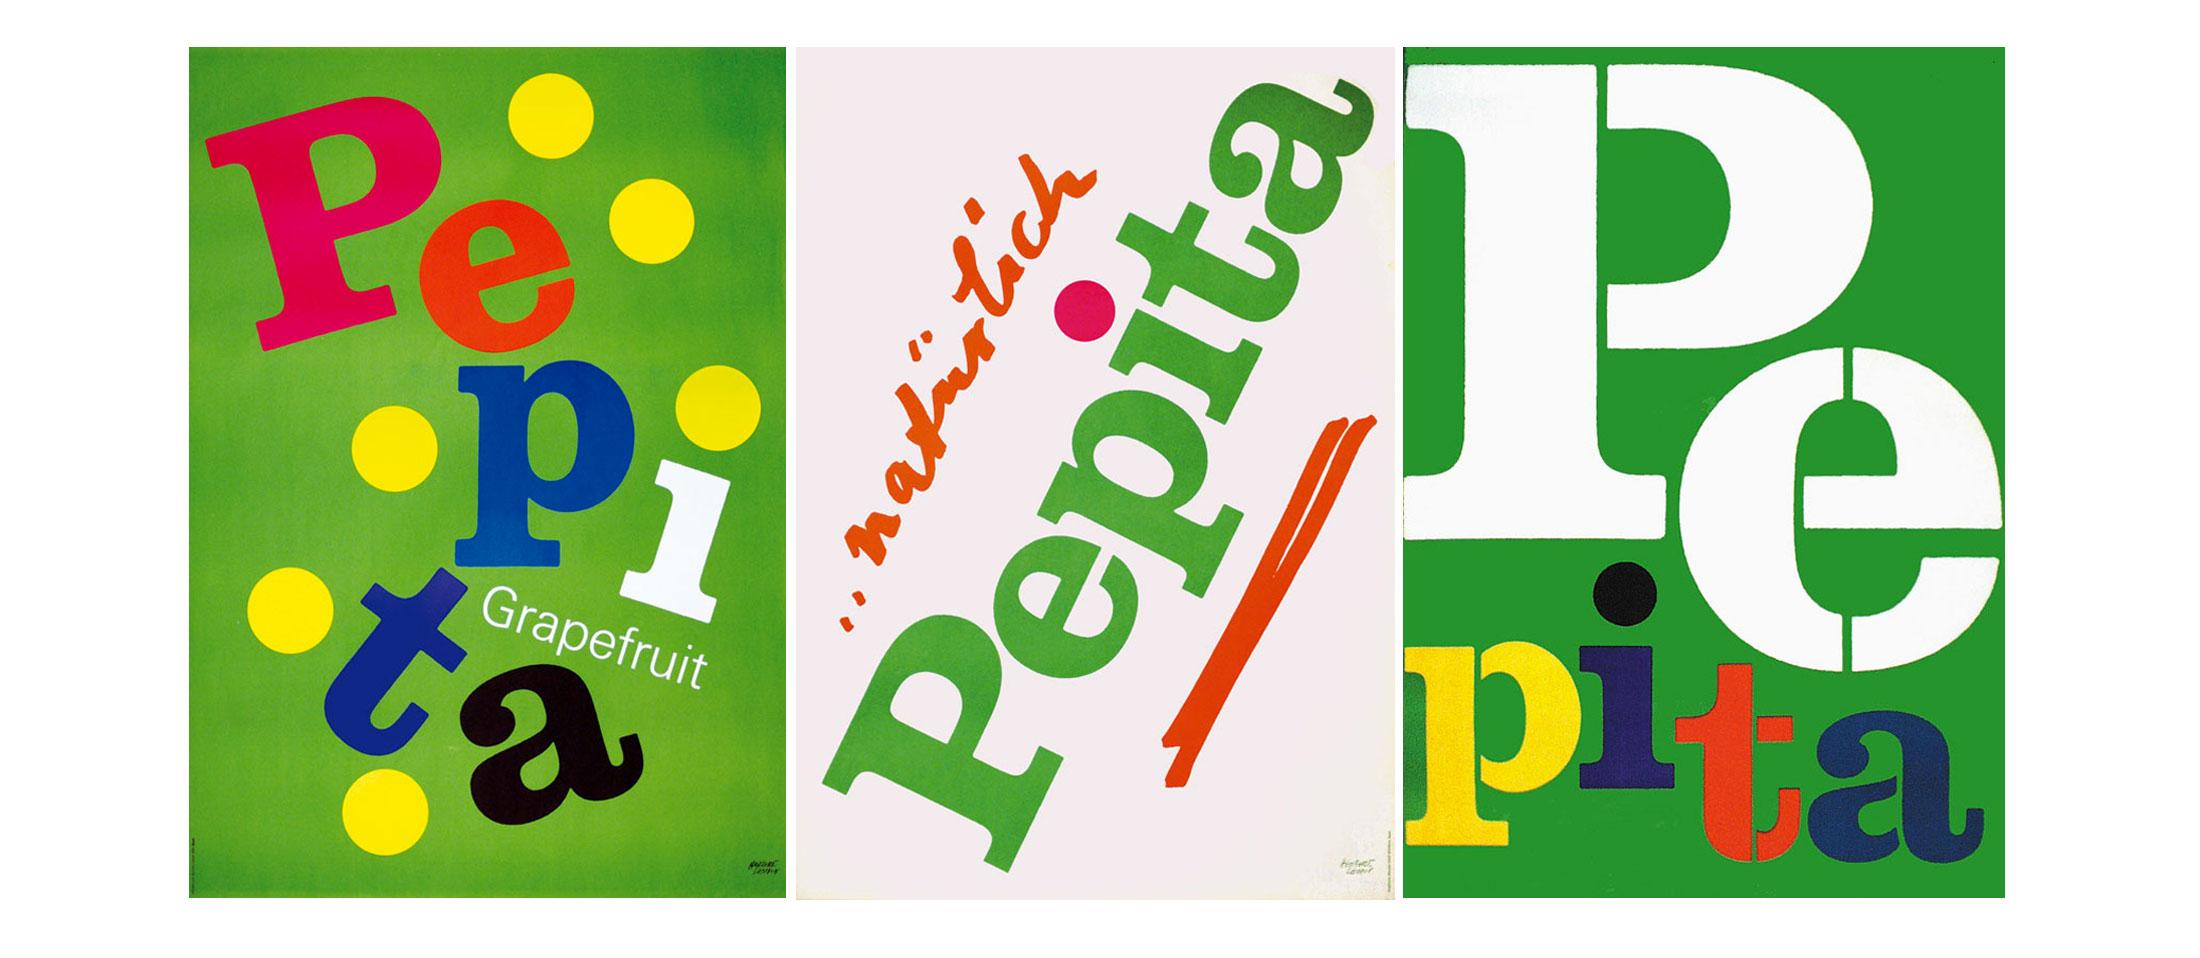 Herbert-Leupin-graphiste-CH-affiches-boisson-pepita-typo